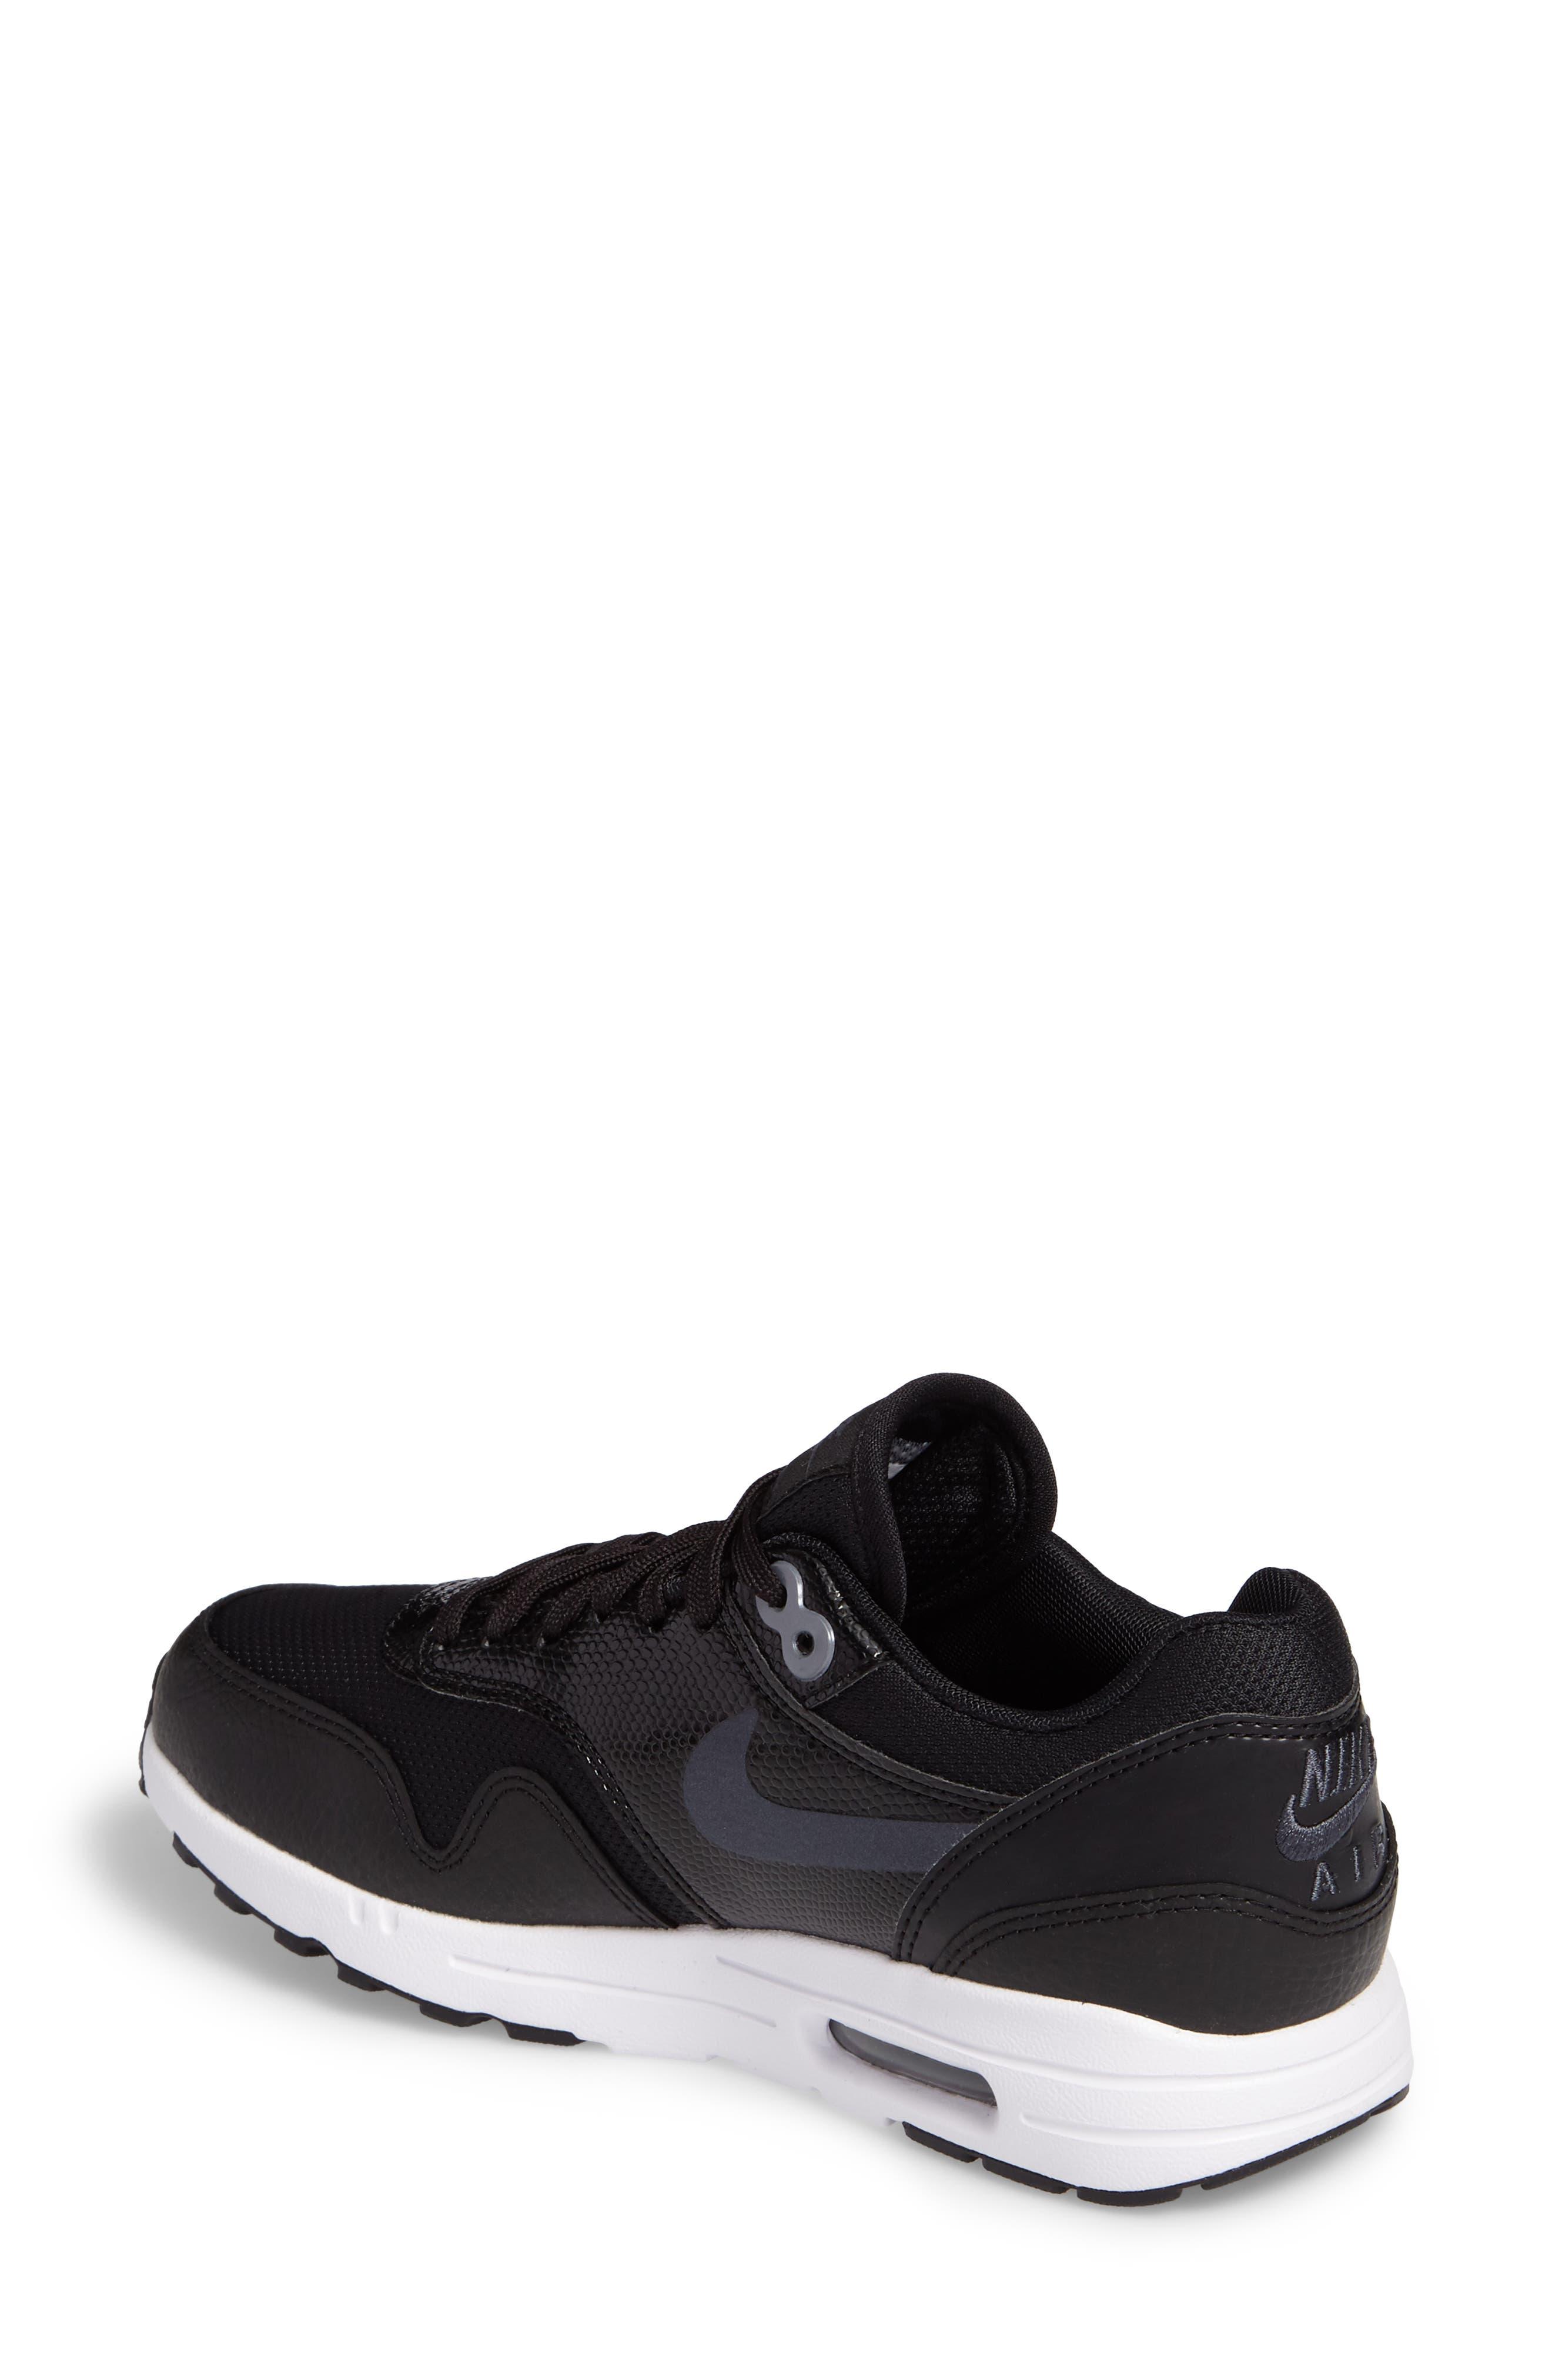 Air Max 1 Ultra 2.0 Running Shoe,                             Alternate thumbnail 2, color,                             Hematite/ Black/ White